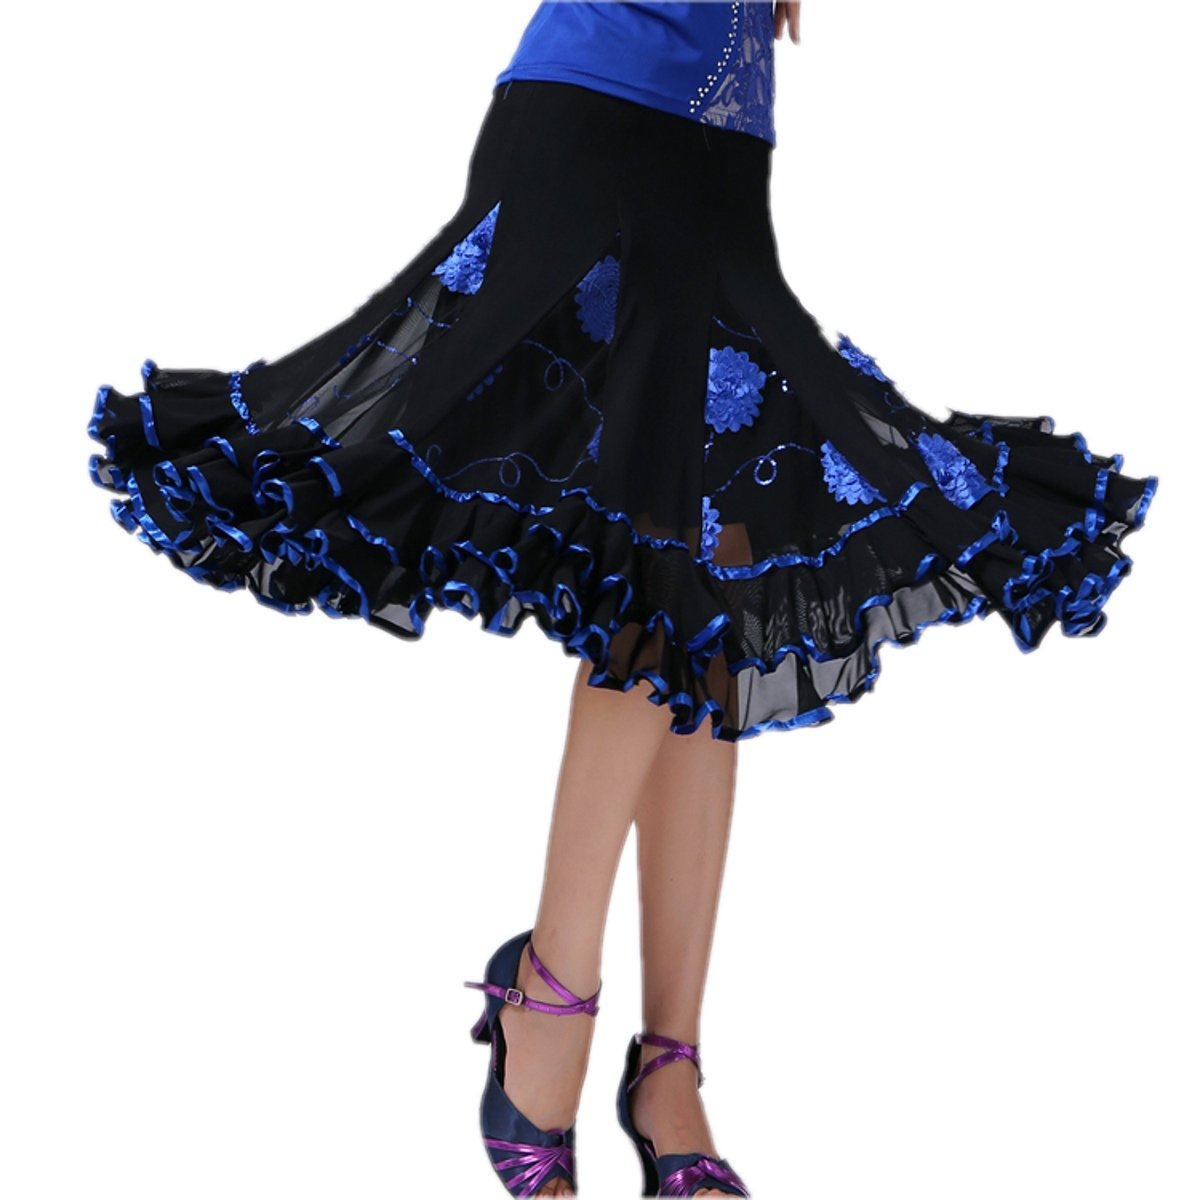 CISMARK Ballroom Latin Salsa Tango Dance Skirt for Women One Size Blue by CISMARK